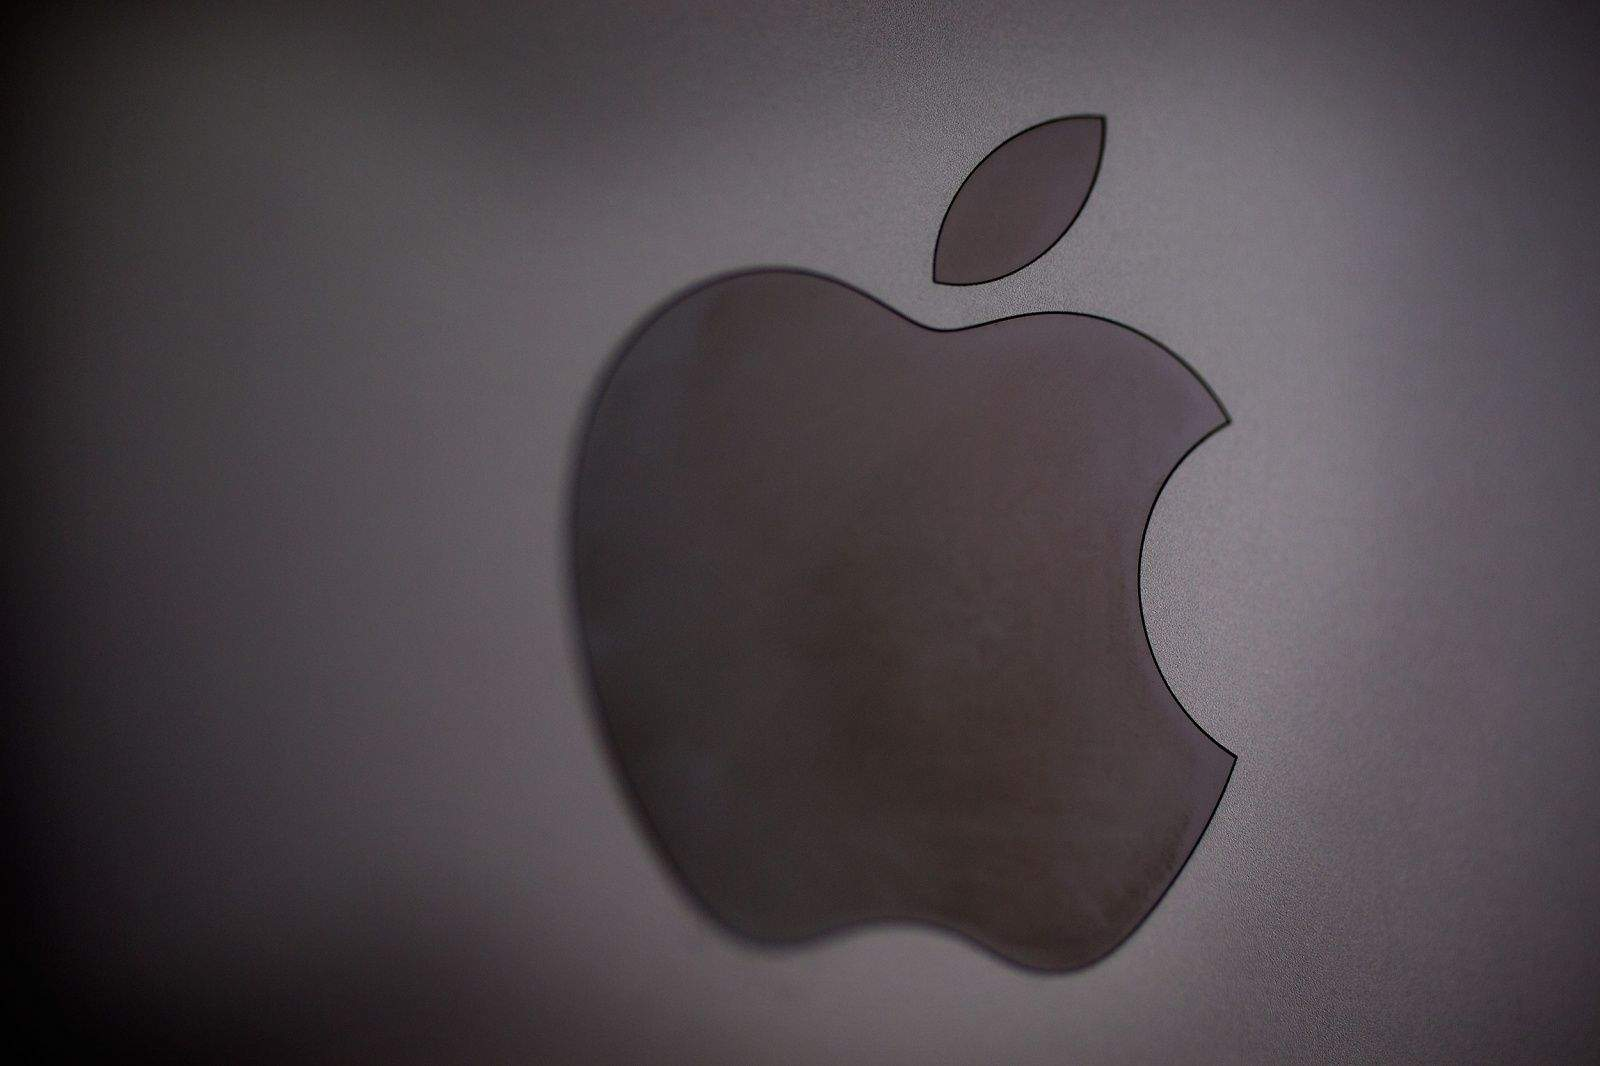 Drawn macbook apple fruit 2015 is Jim Mac Cult